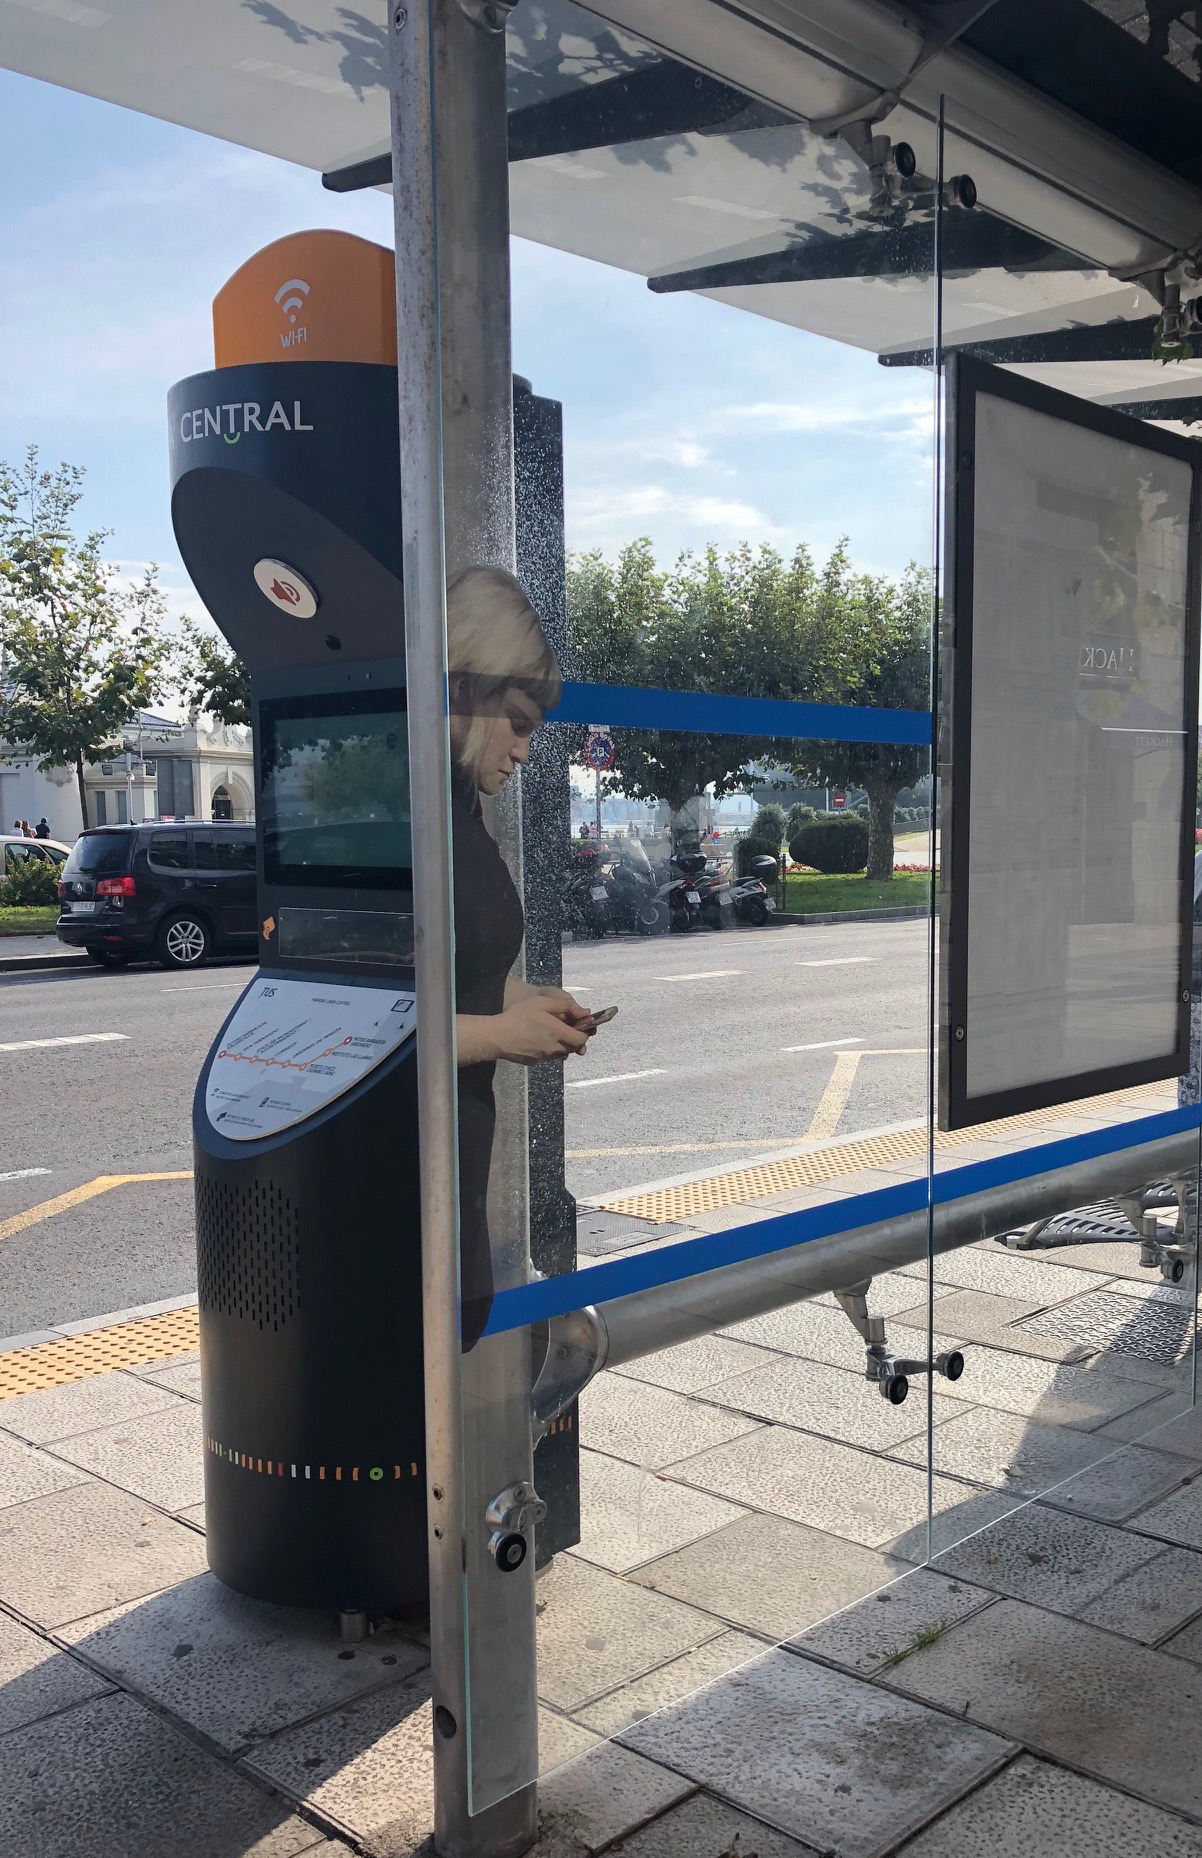 Avert, installation view Art in the Open, downtown Charlottetown PEI, 2017. Image credit Heather Leier